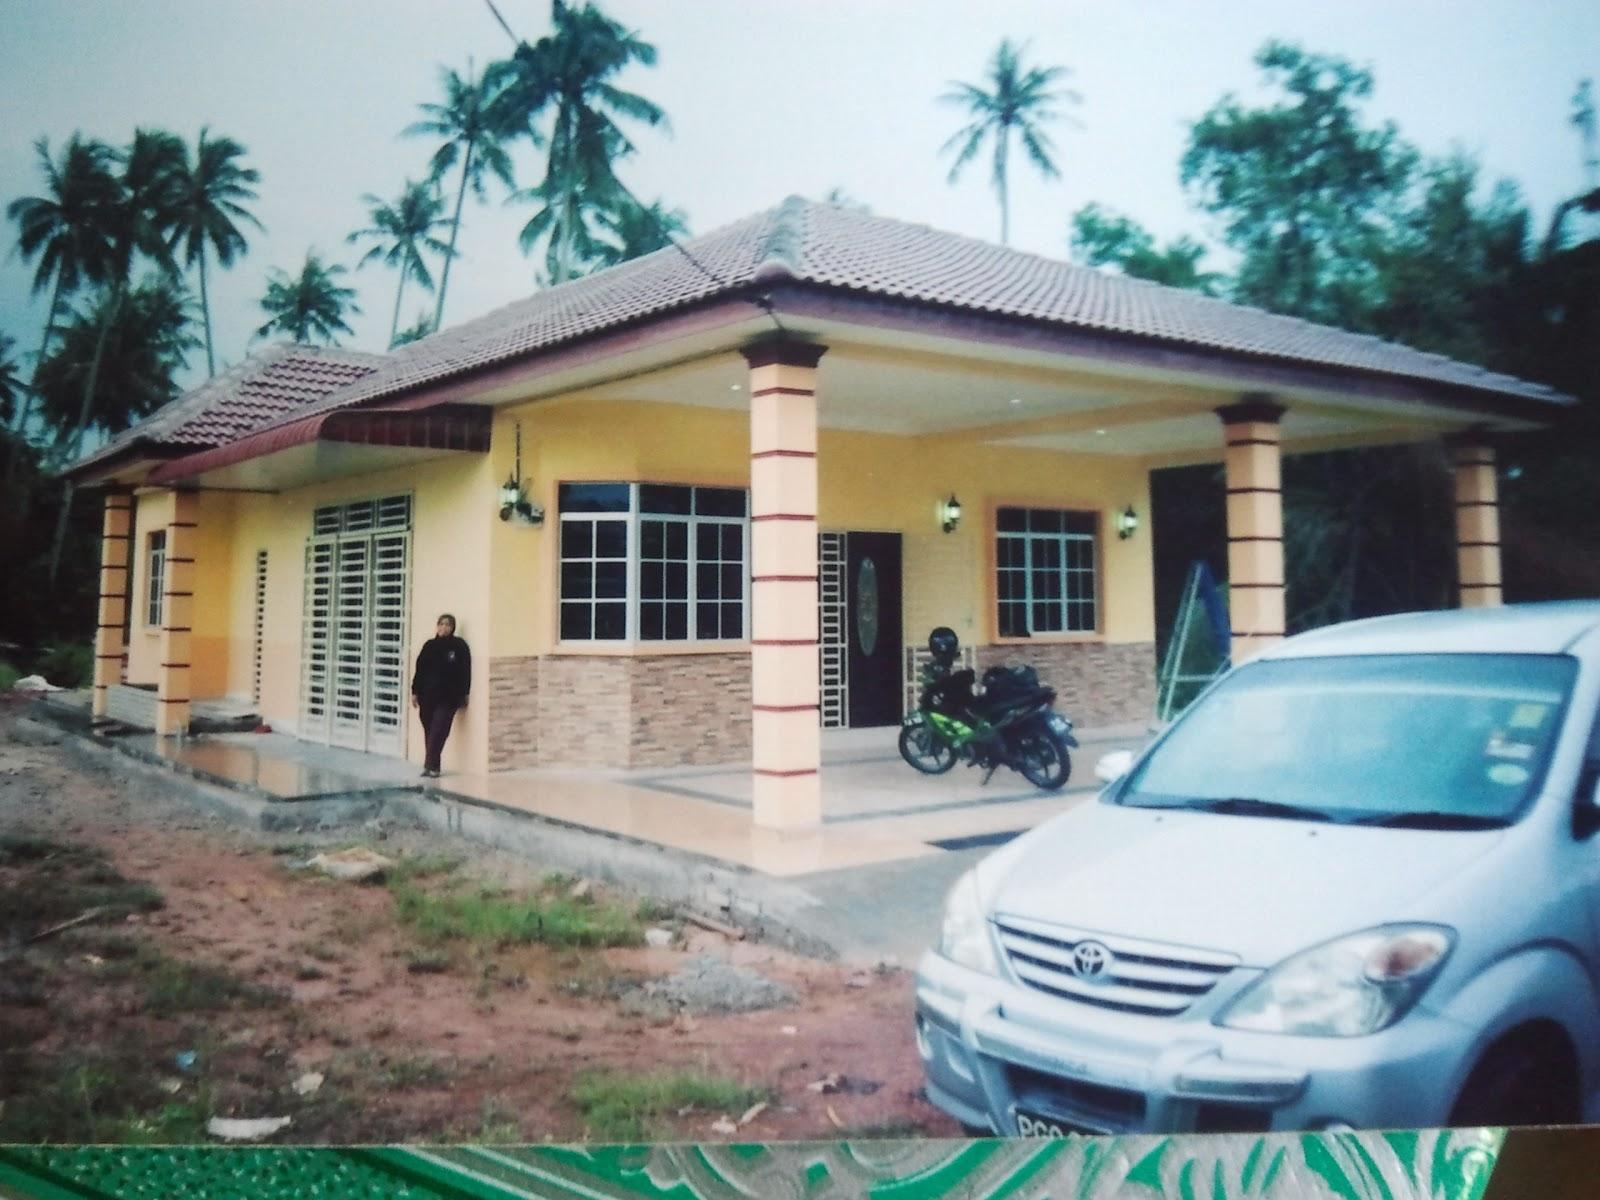 Kontraktor Bina Dan Ubahsuai Renovate Rumah Pulau Pinang | Share The ...